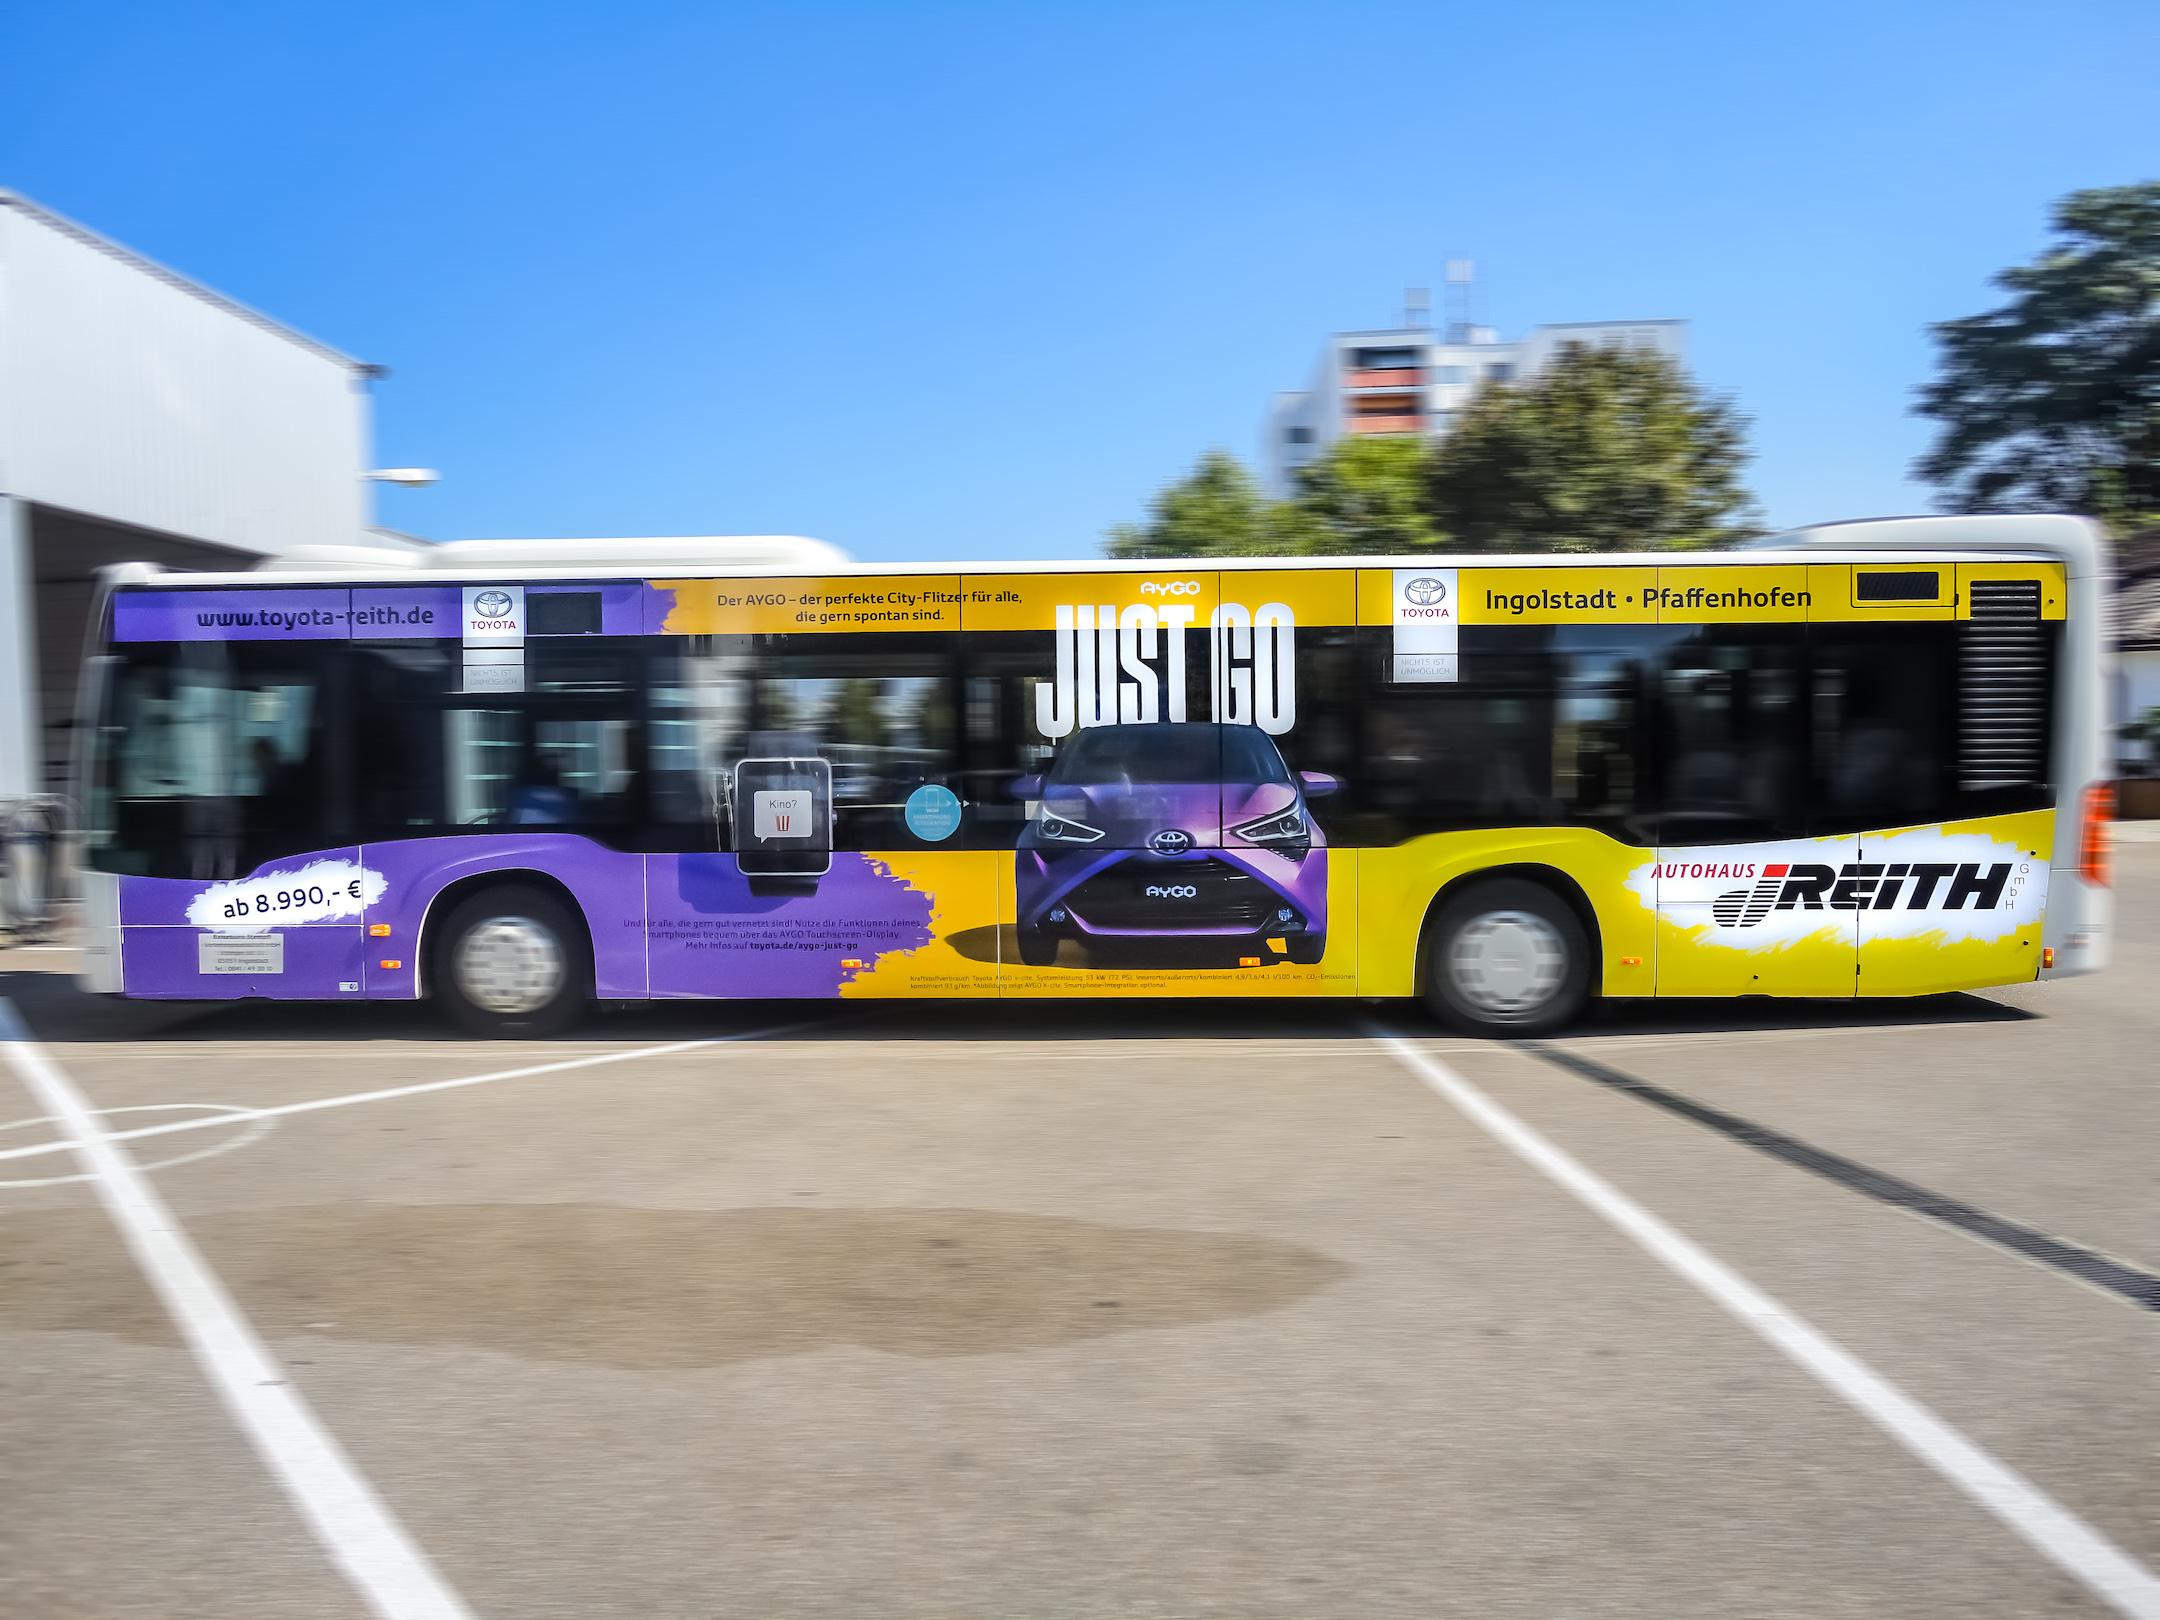 Toyota Reith • Buswerbung Ingolstadt